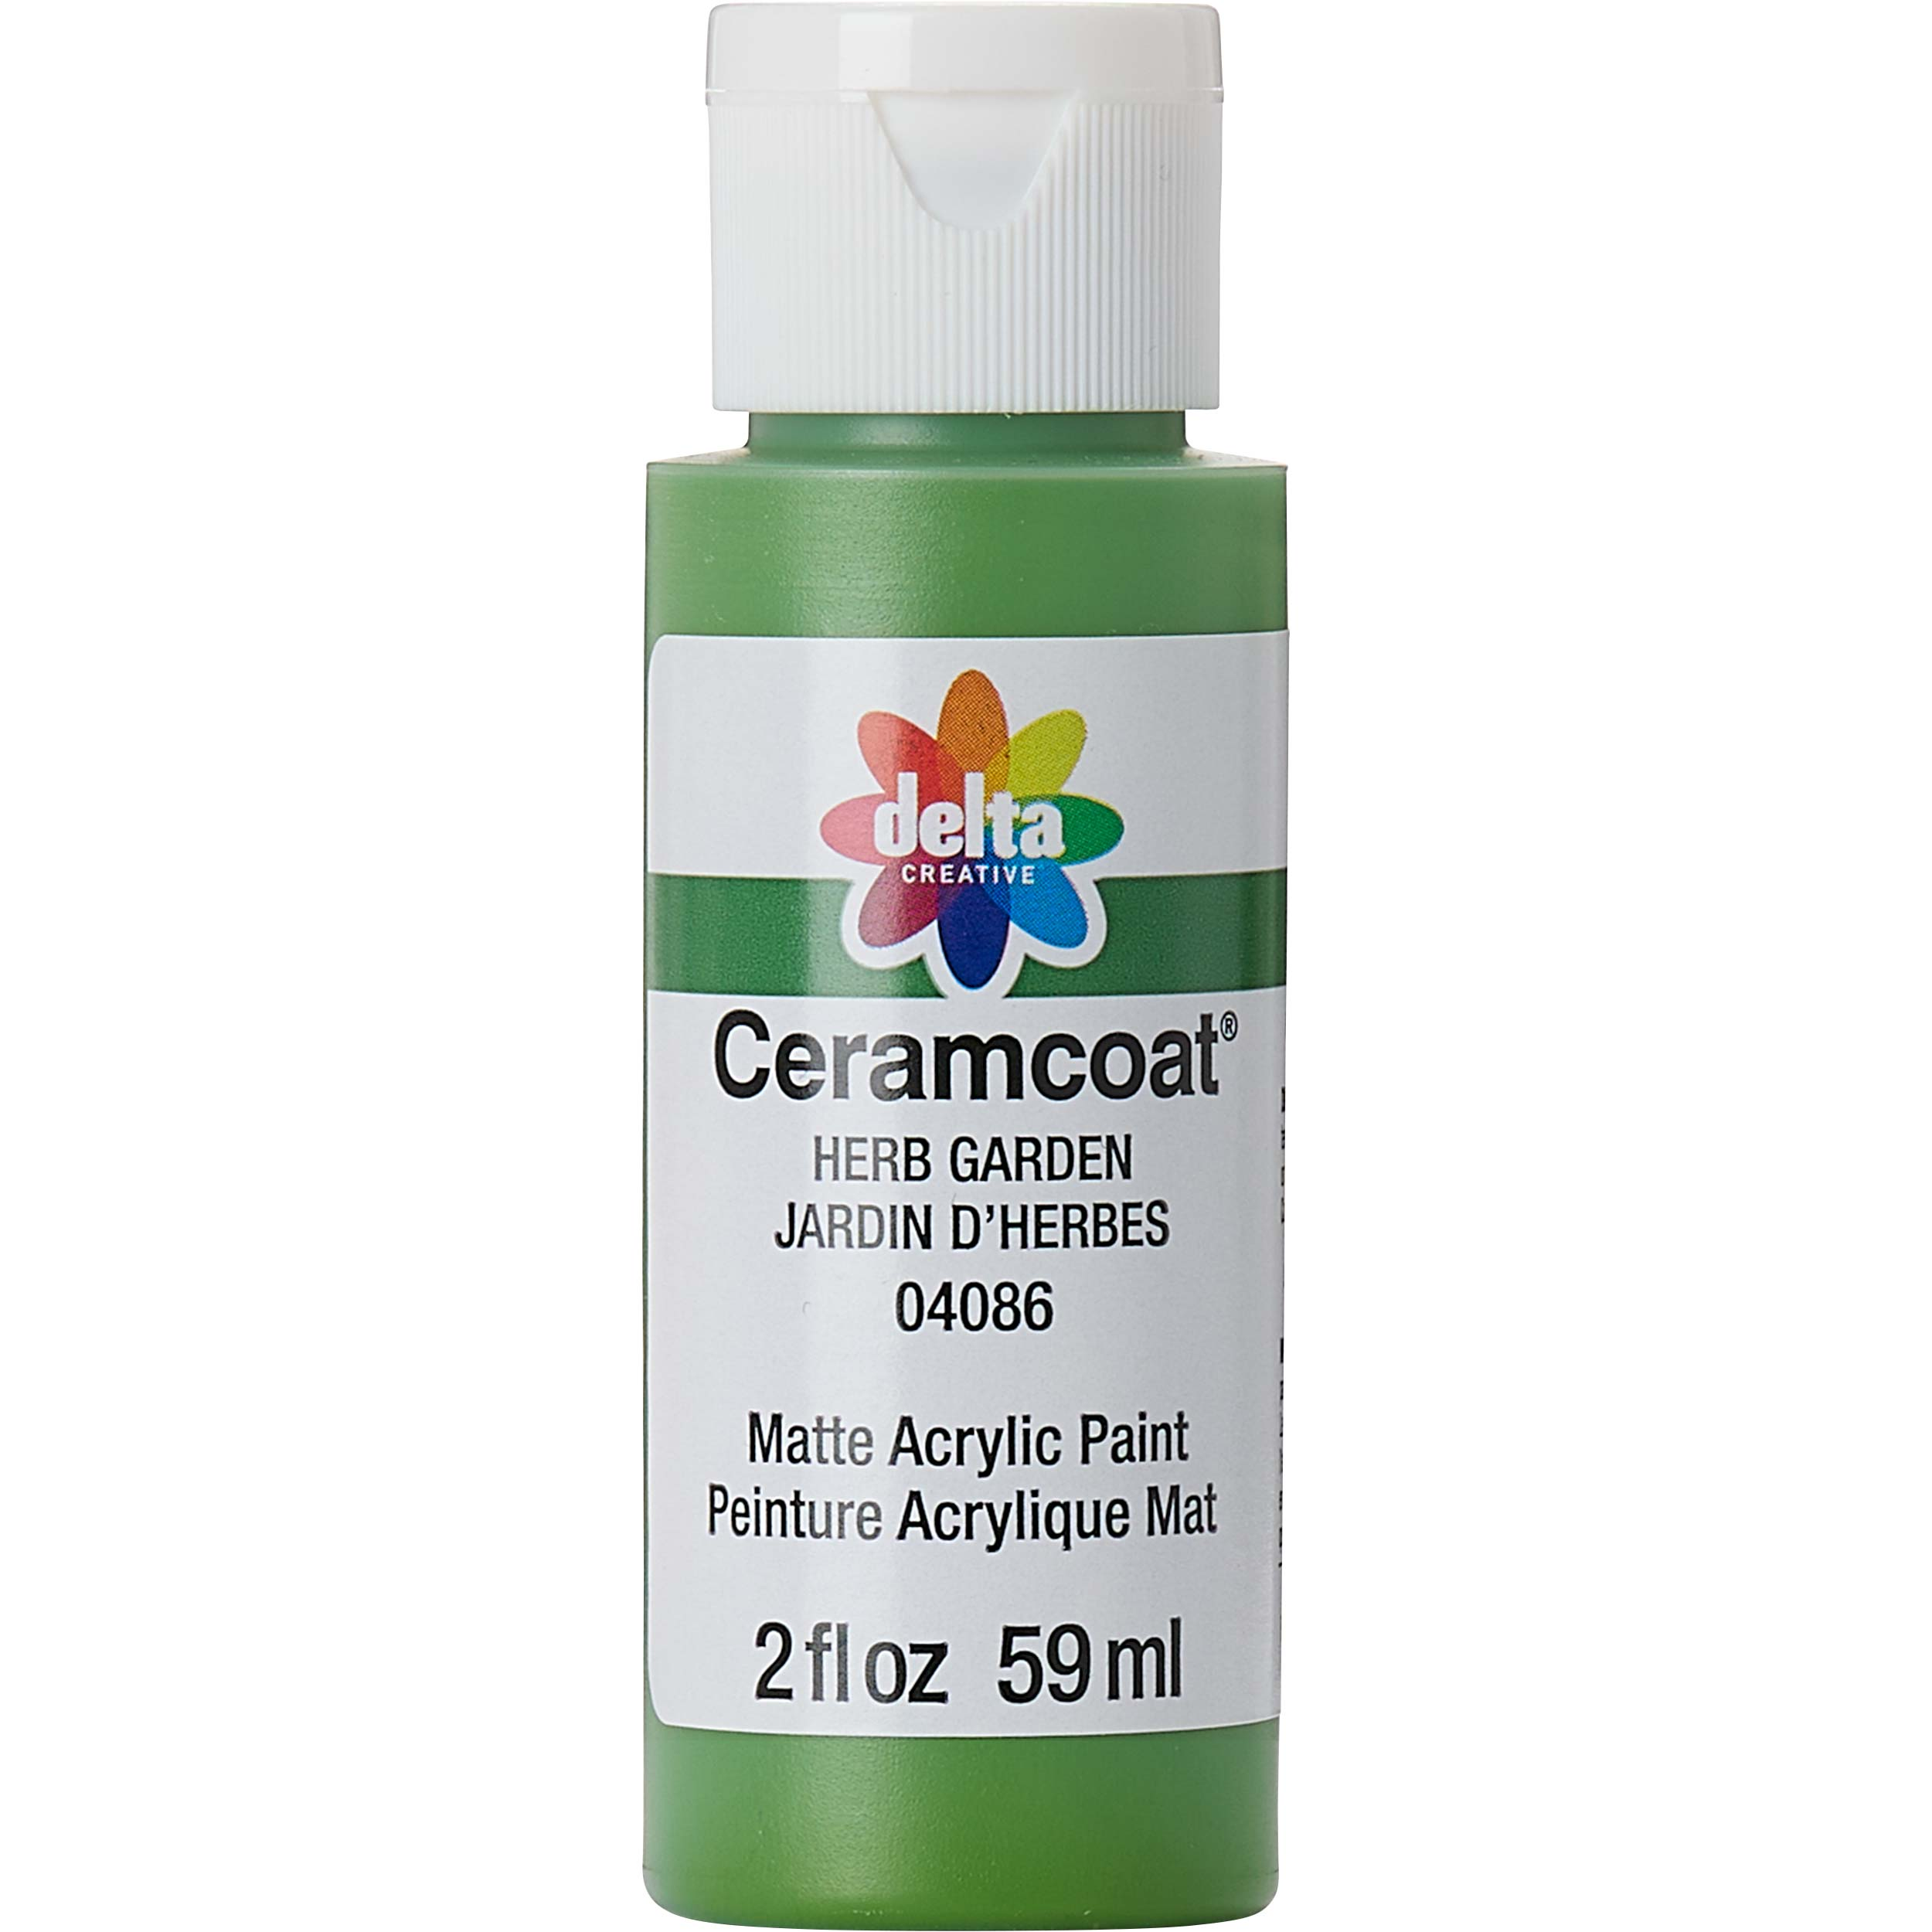 Delta Ceramcoat ® Acrylic Paint - Herb Garden, 2 oz.